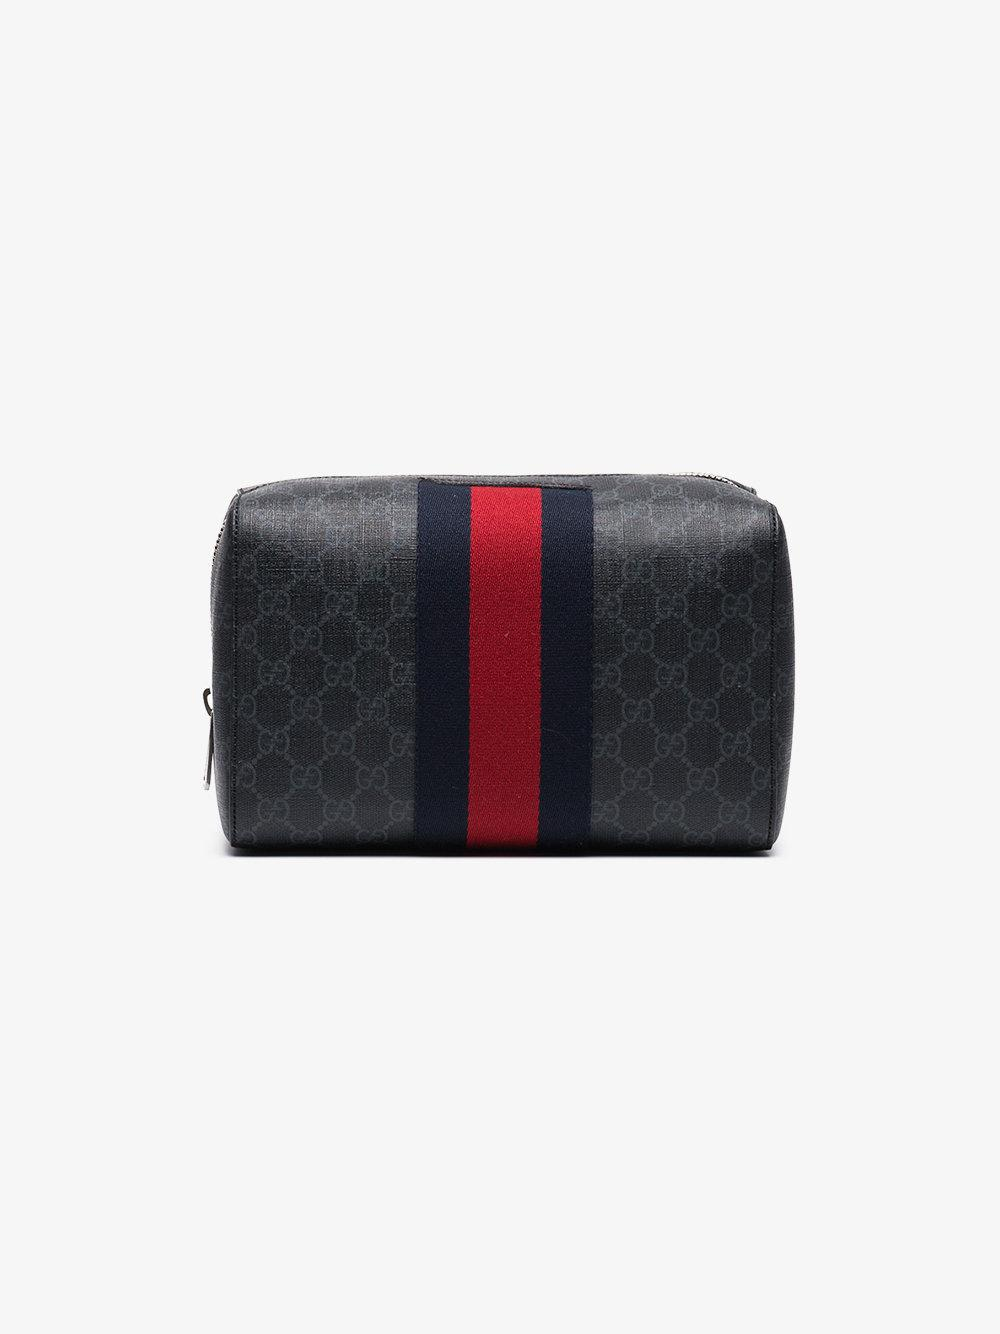 9646985869c Lyst - Gucci Gg Supreme Toiletry Case in Black